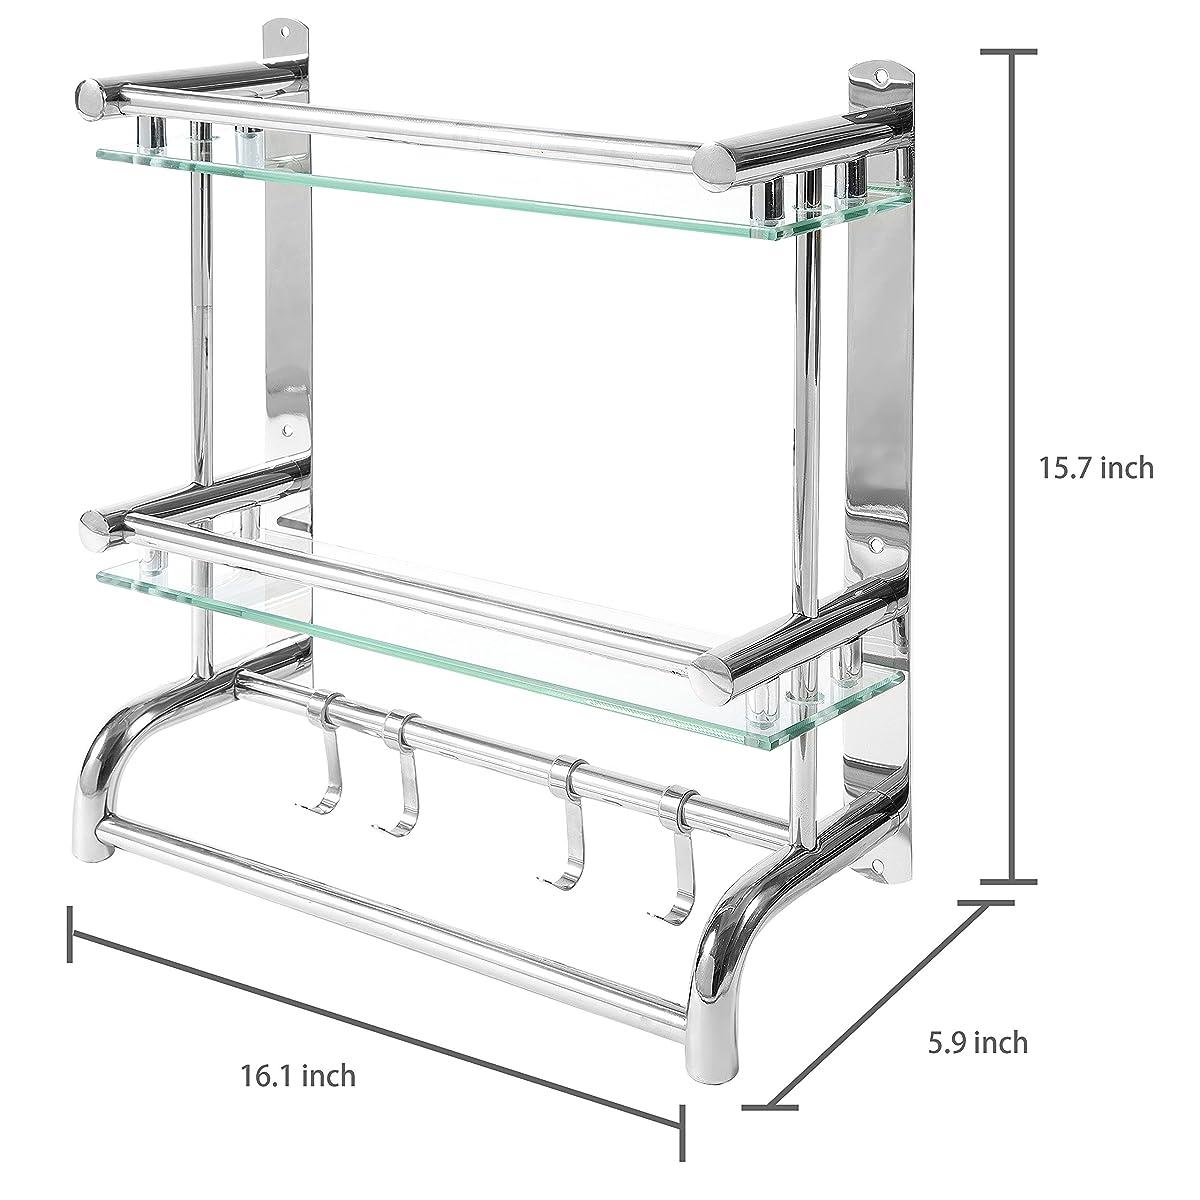 MyGift Wall Mounted Stainless Steel Bathroom Shelf Rack, 2 Tier Glass Shelves & 2 Towel Bars with Hooks